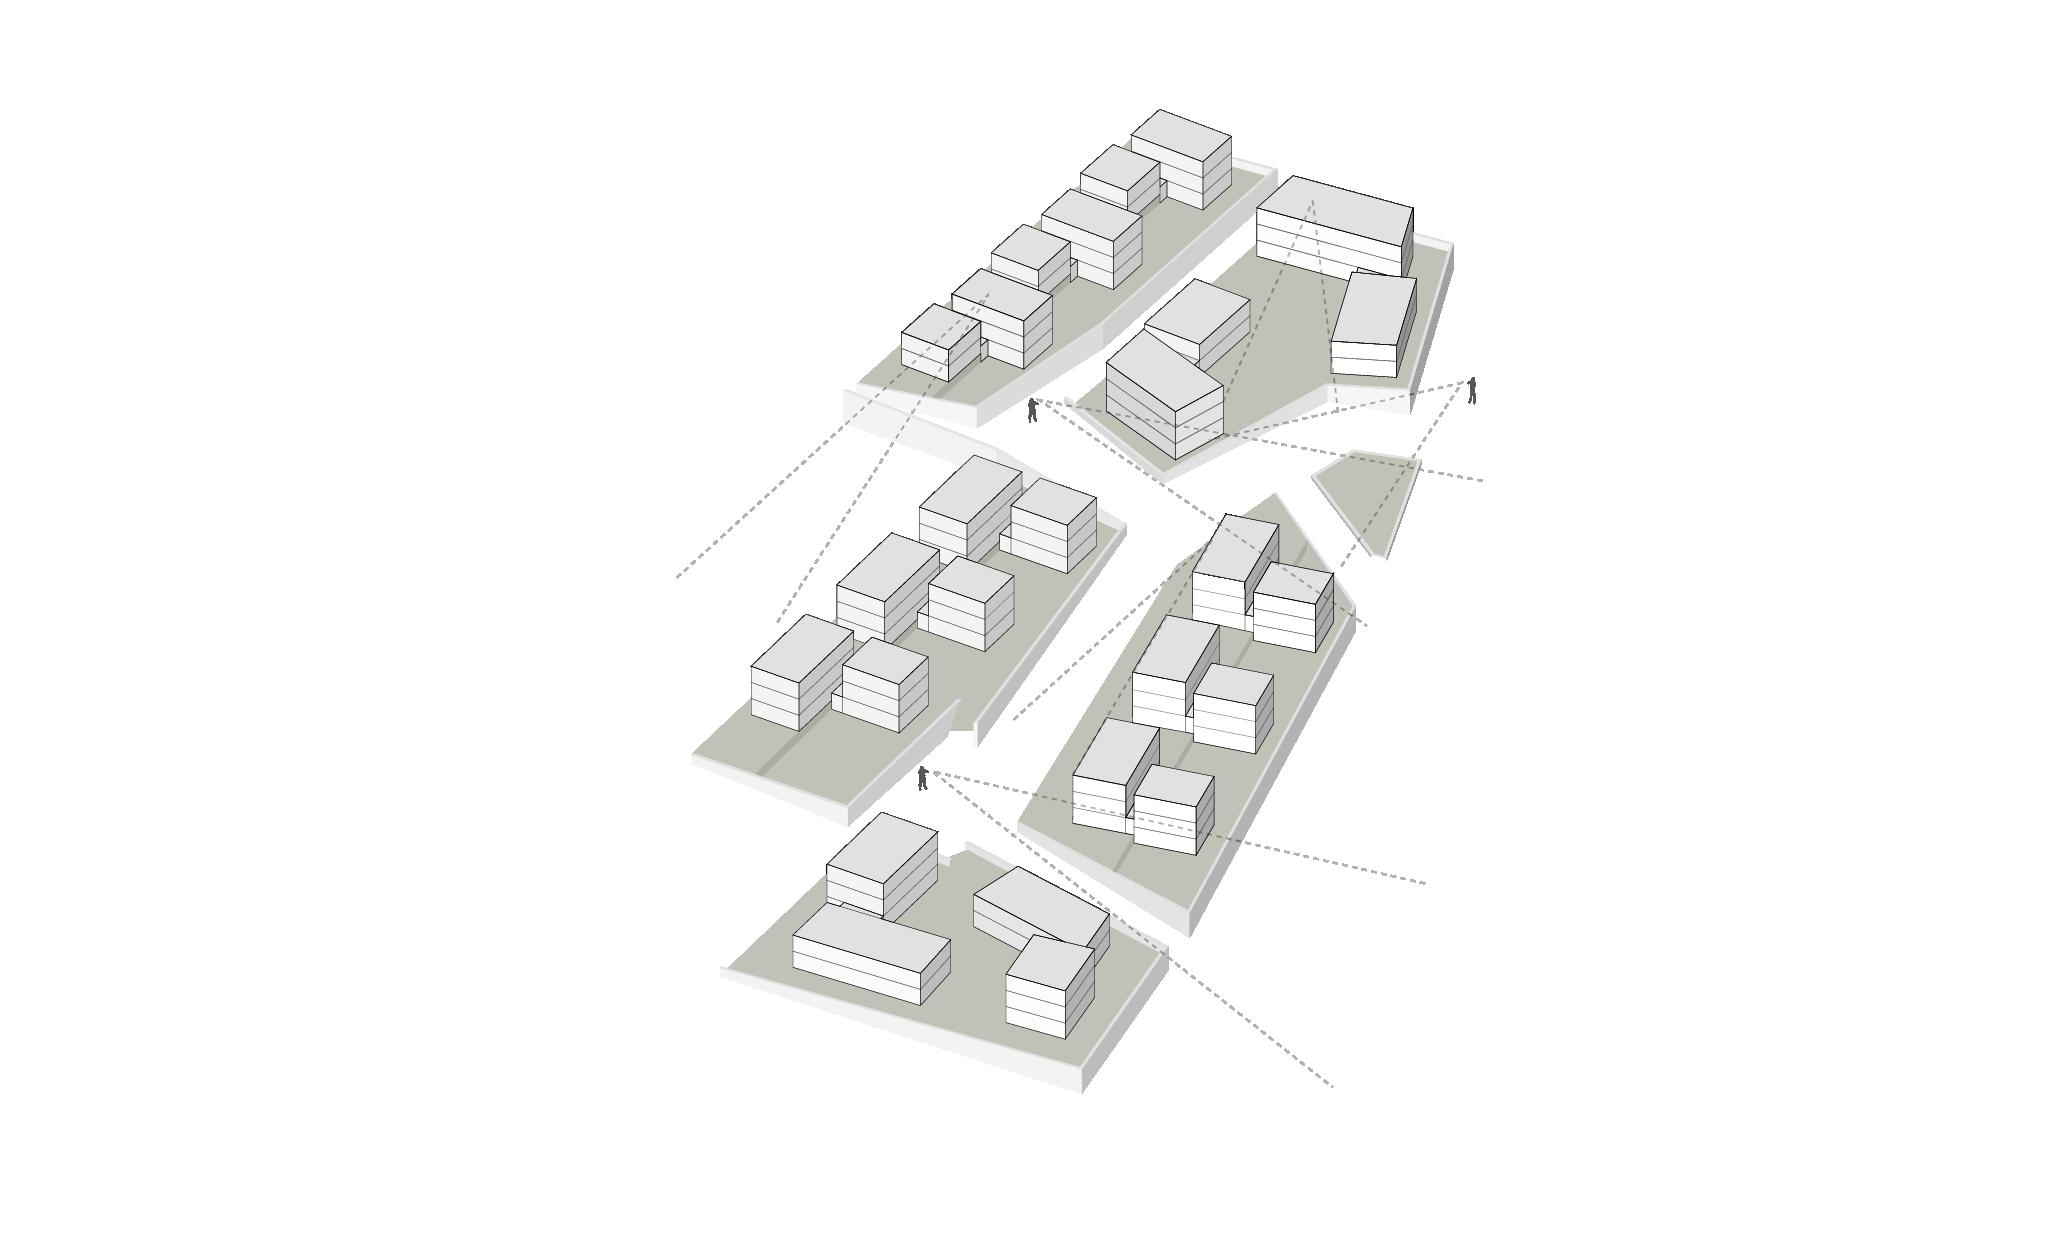 Konstanz Litzelstetten Marienweg Wettbewerb Sichten Blickbeziehungen Staffelung Konzept Grafik